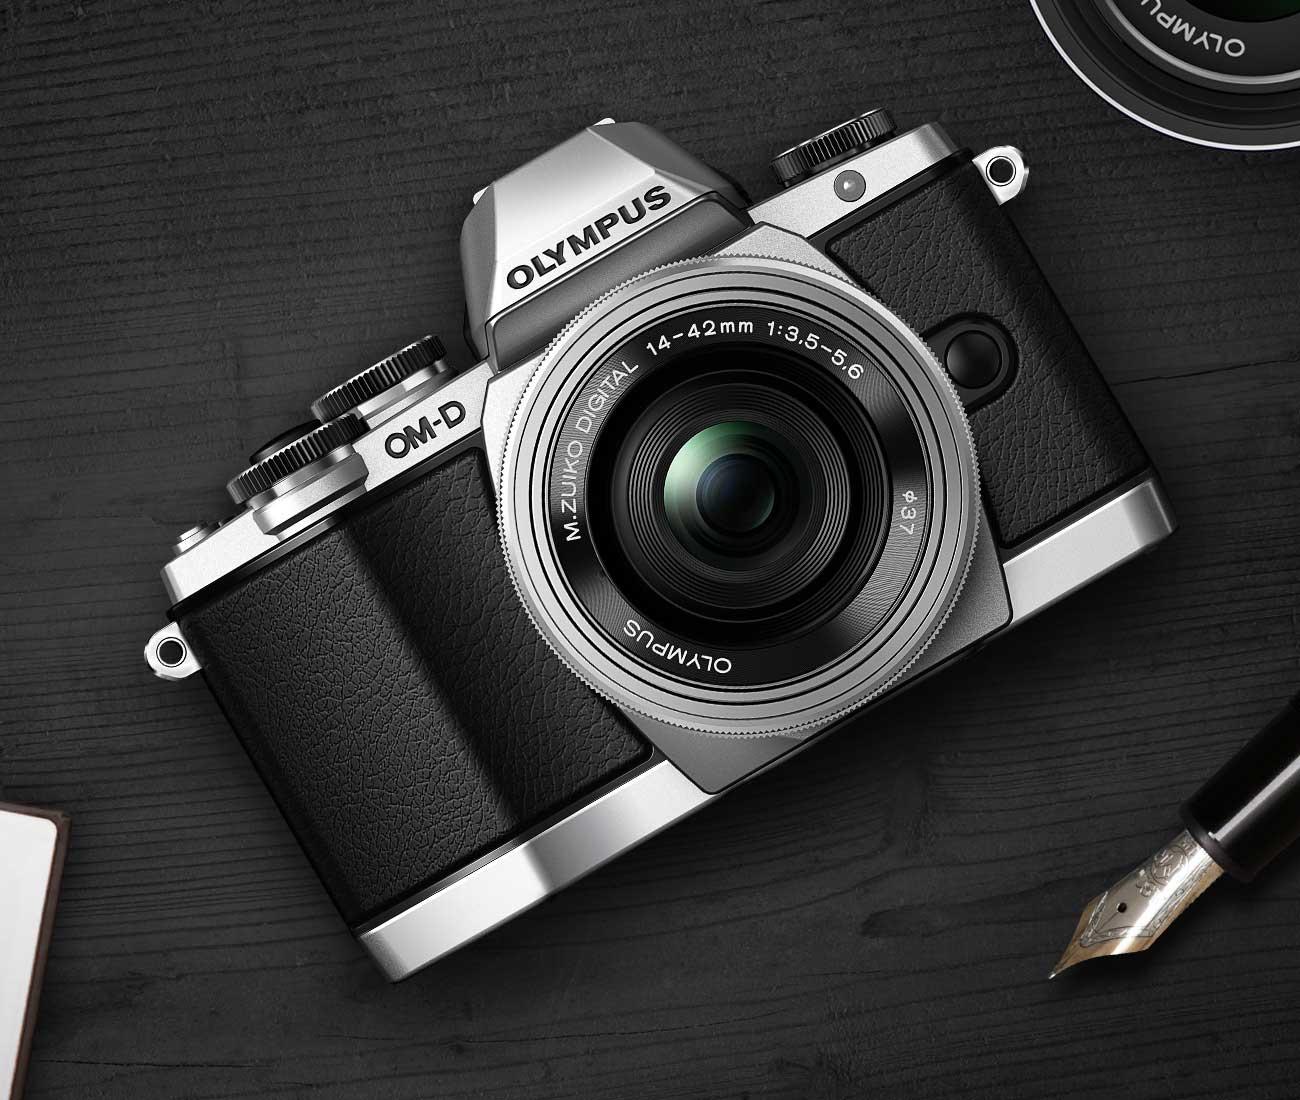 Olympus OM-D E-M10 eletta miglior Compact System Camera Entry Level